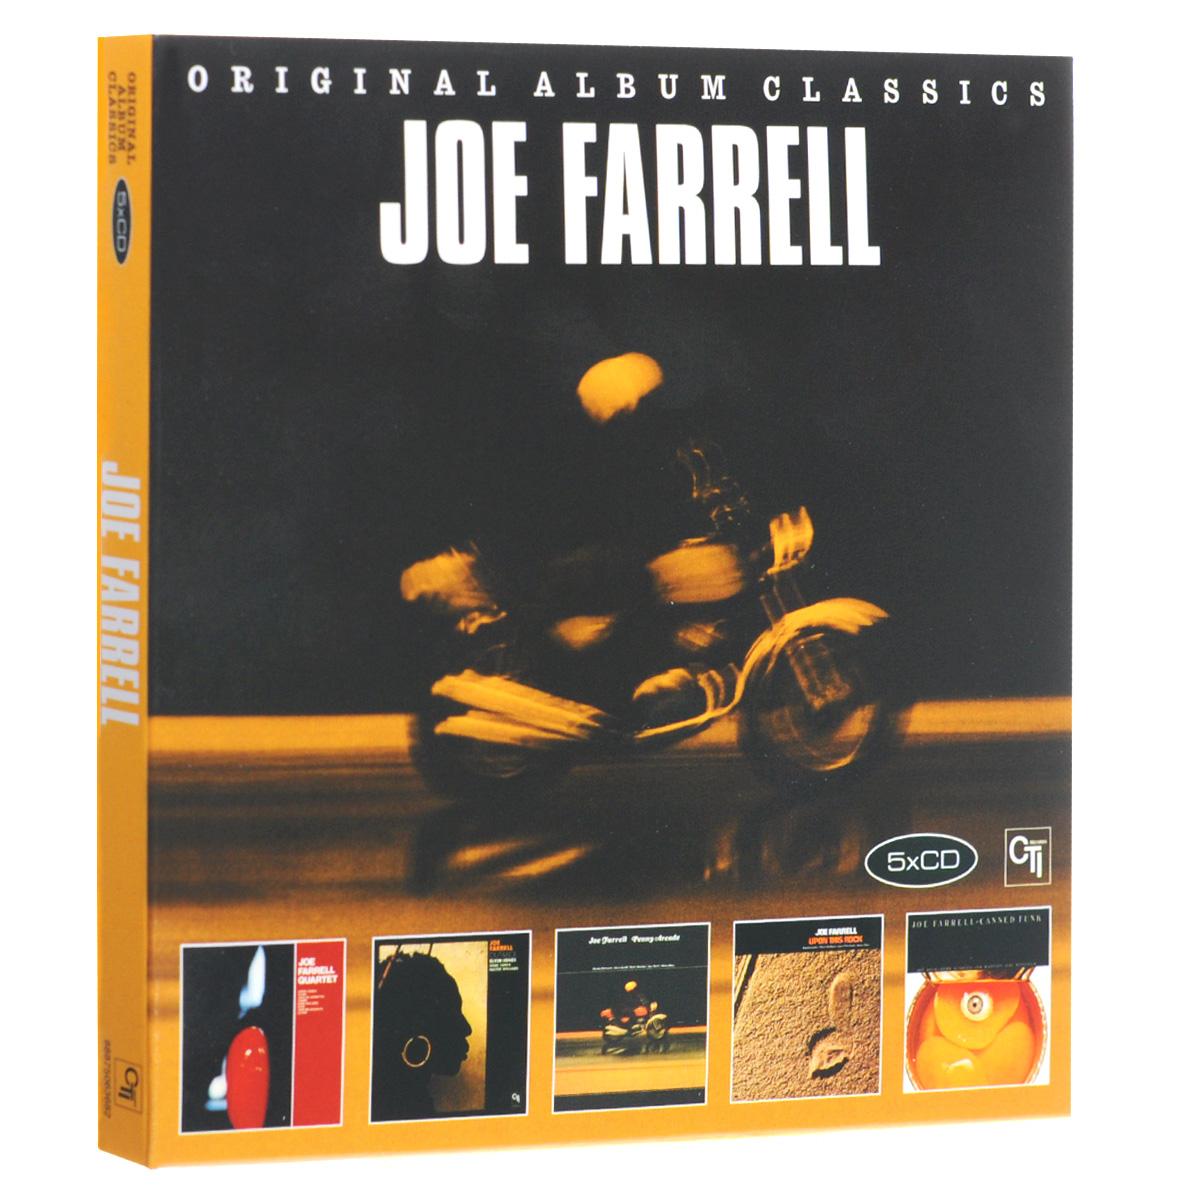 Джо Фарелл Joe Farrell. Original Album Classics (5 CD) джо сатриани joe satriani original album classics 5 cd